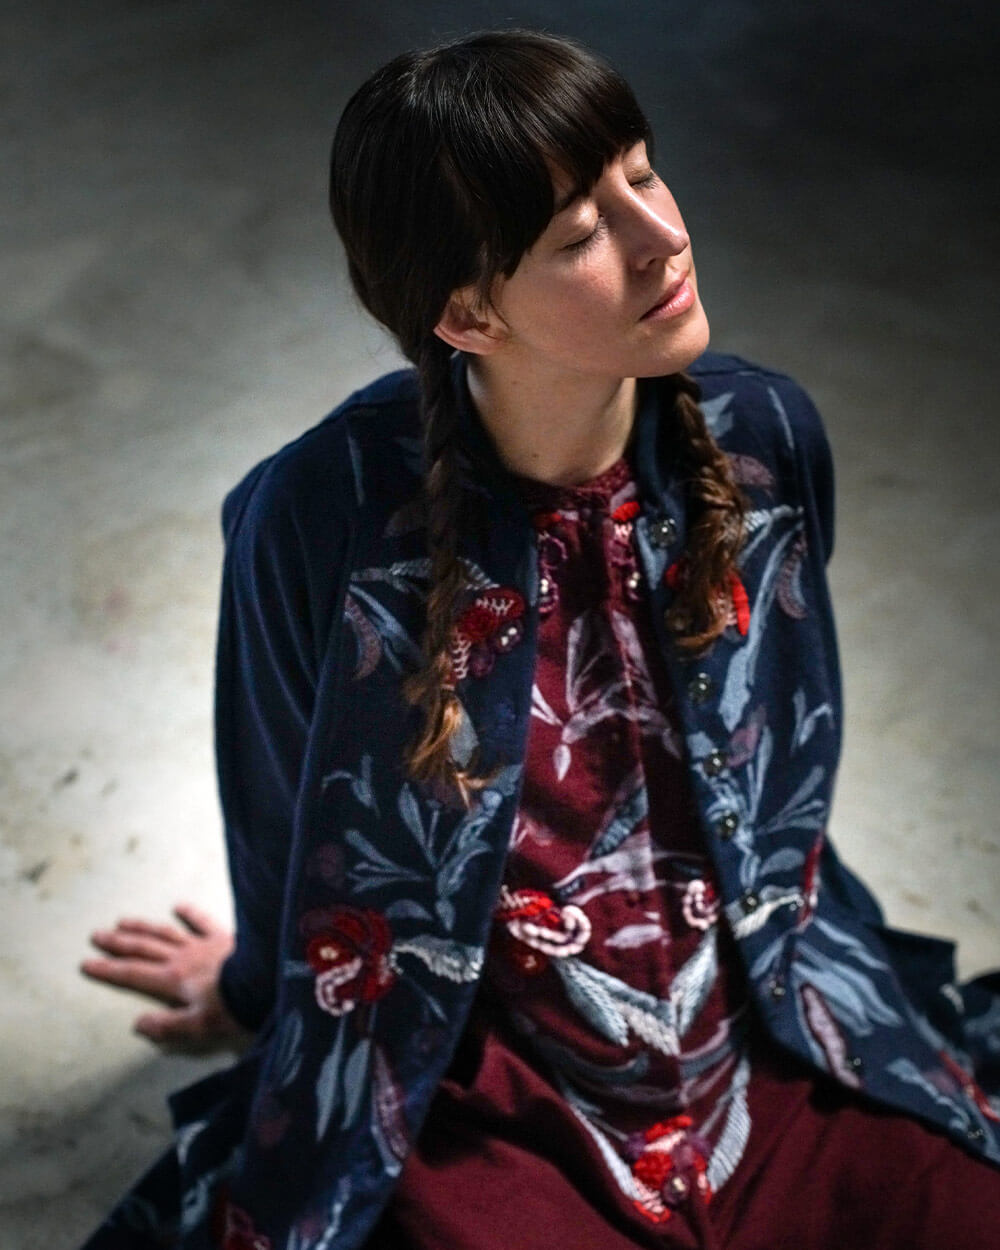 Slow fashion Alabama Chanin label